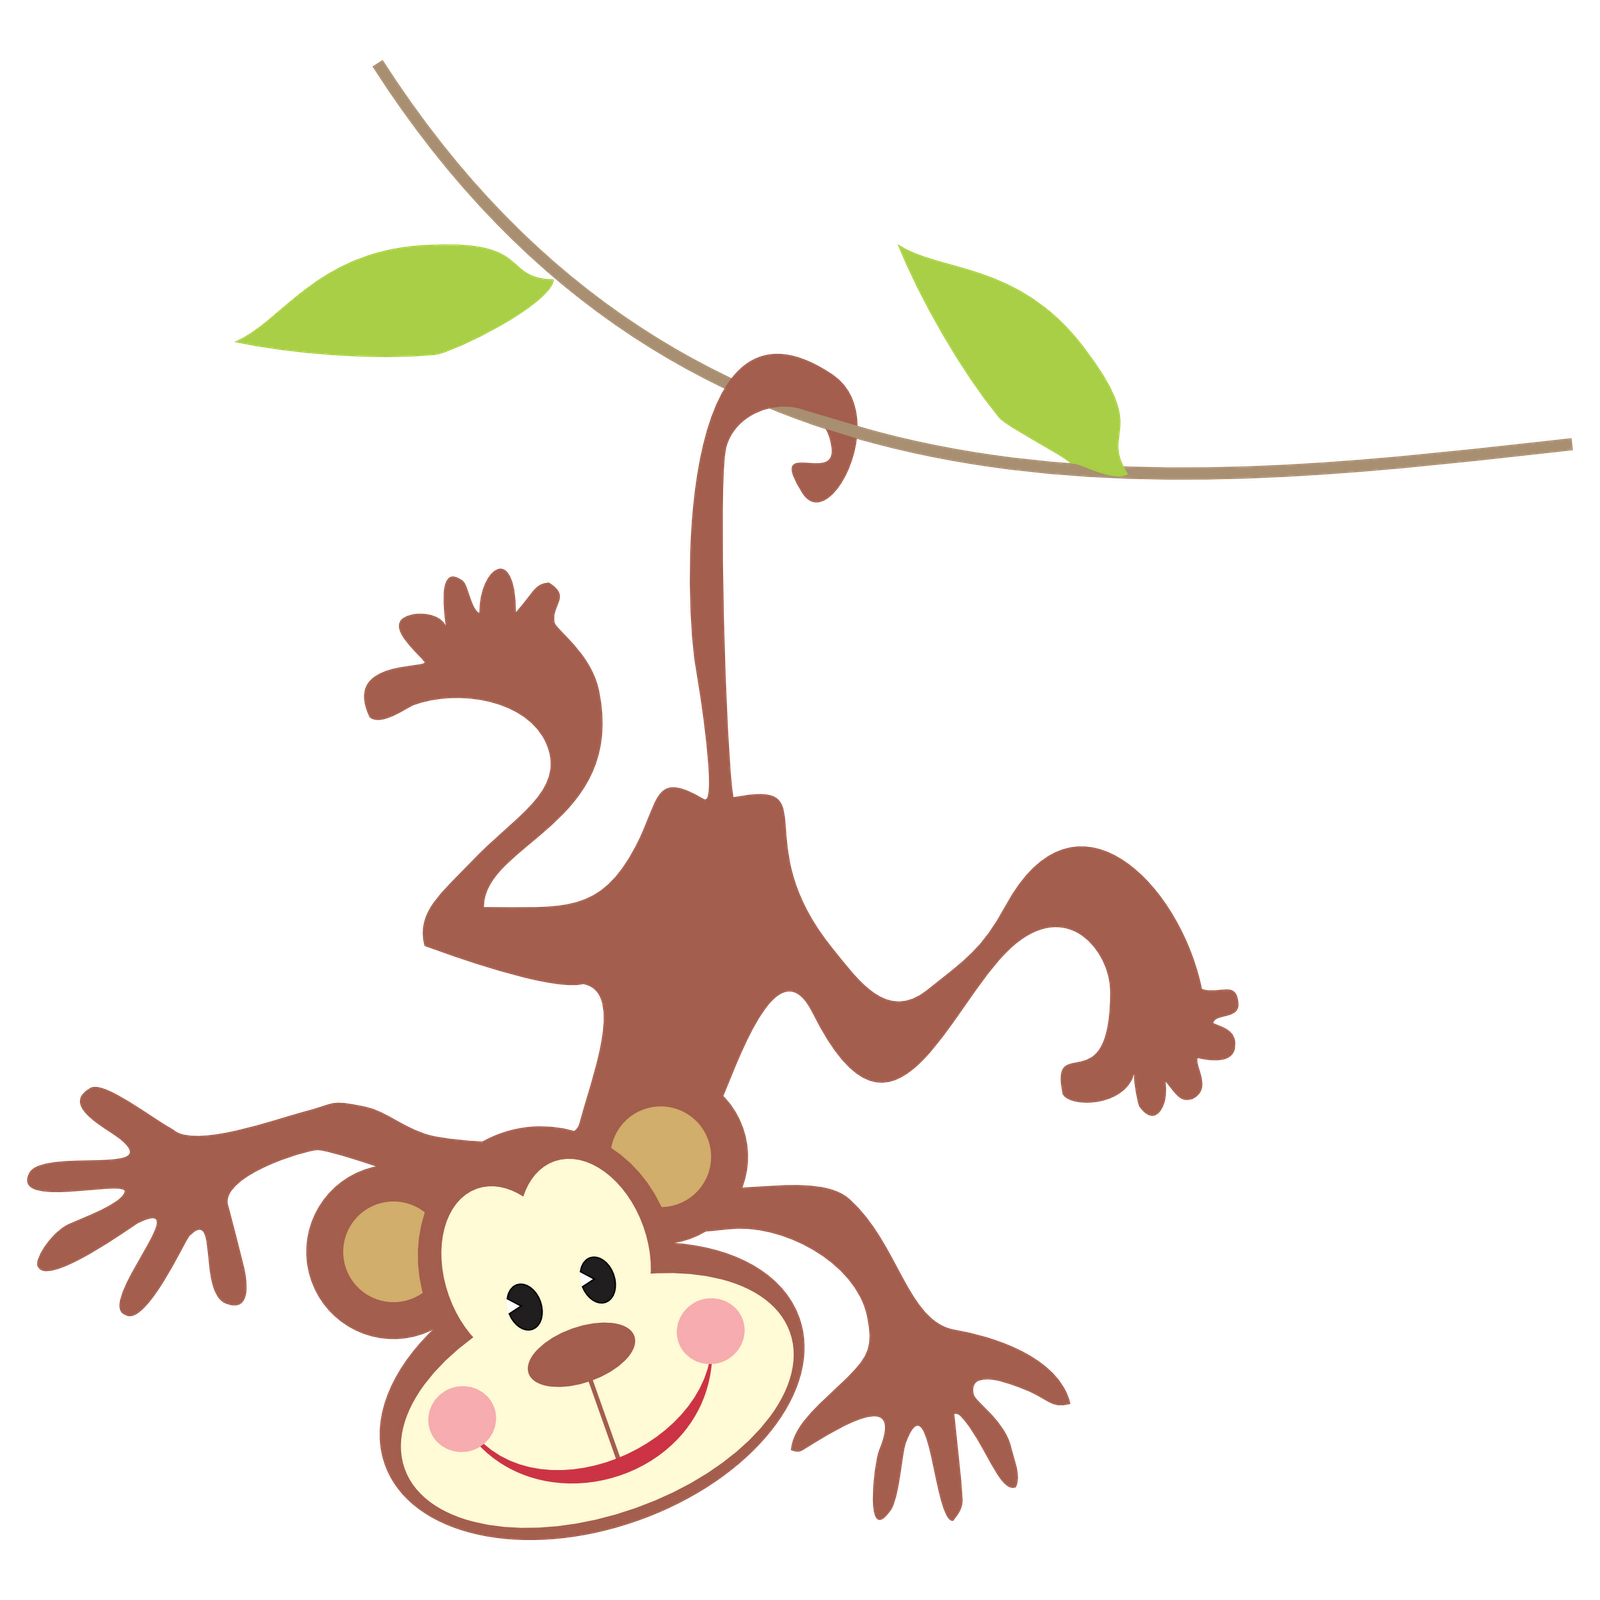 Safari clipart rainforest monkey Clipart Clip monkey Baby Art